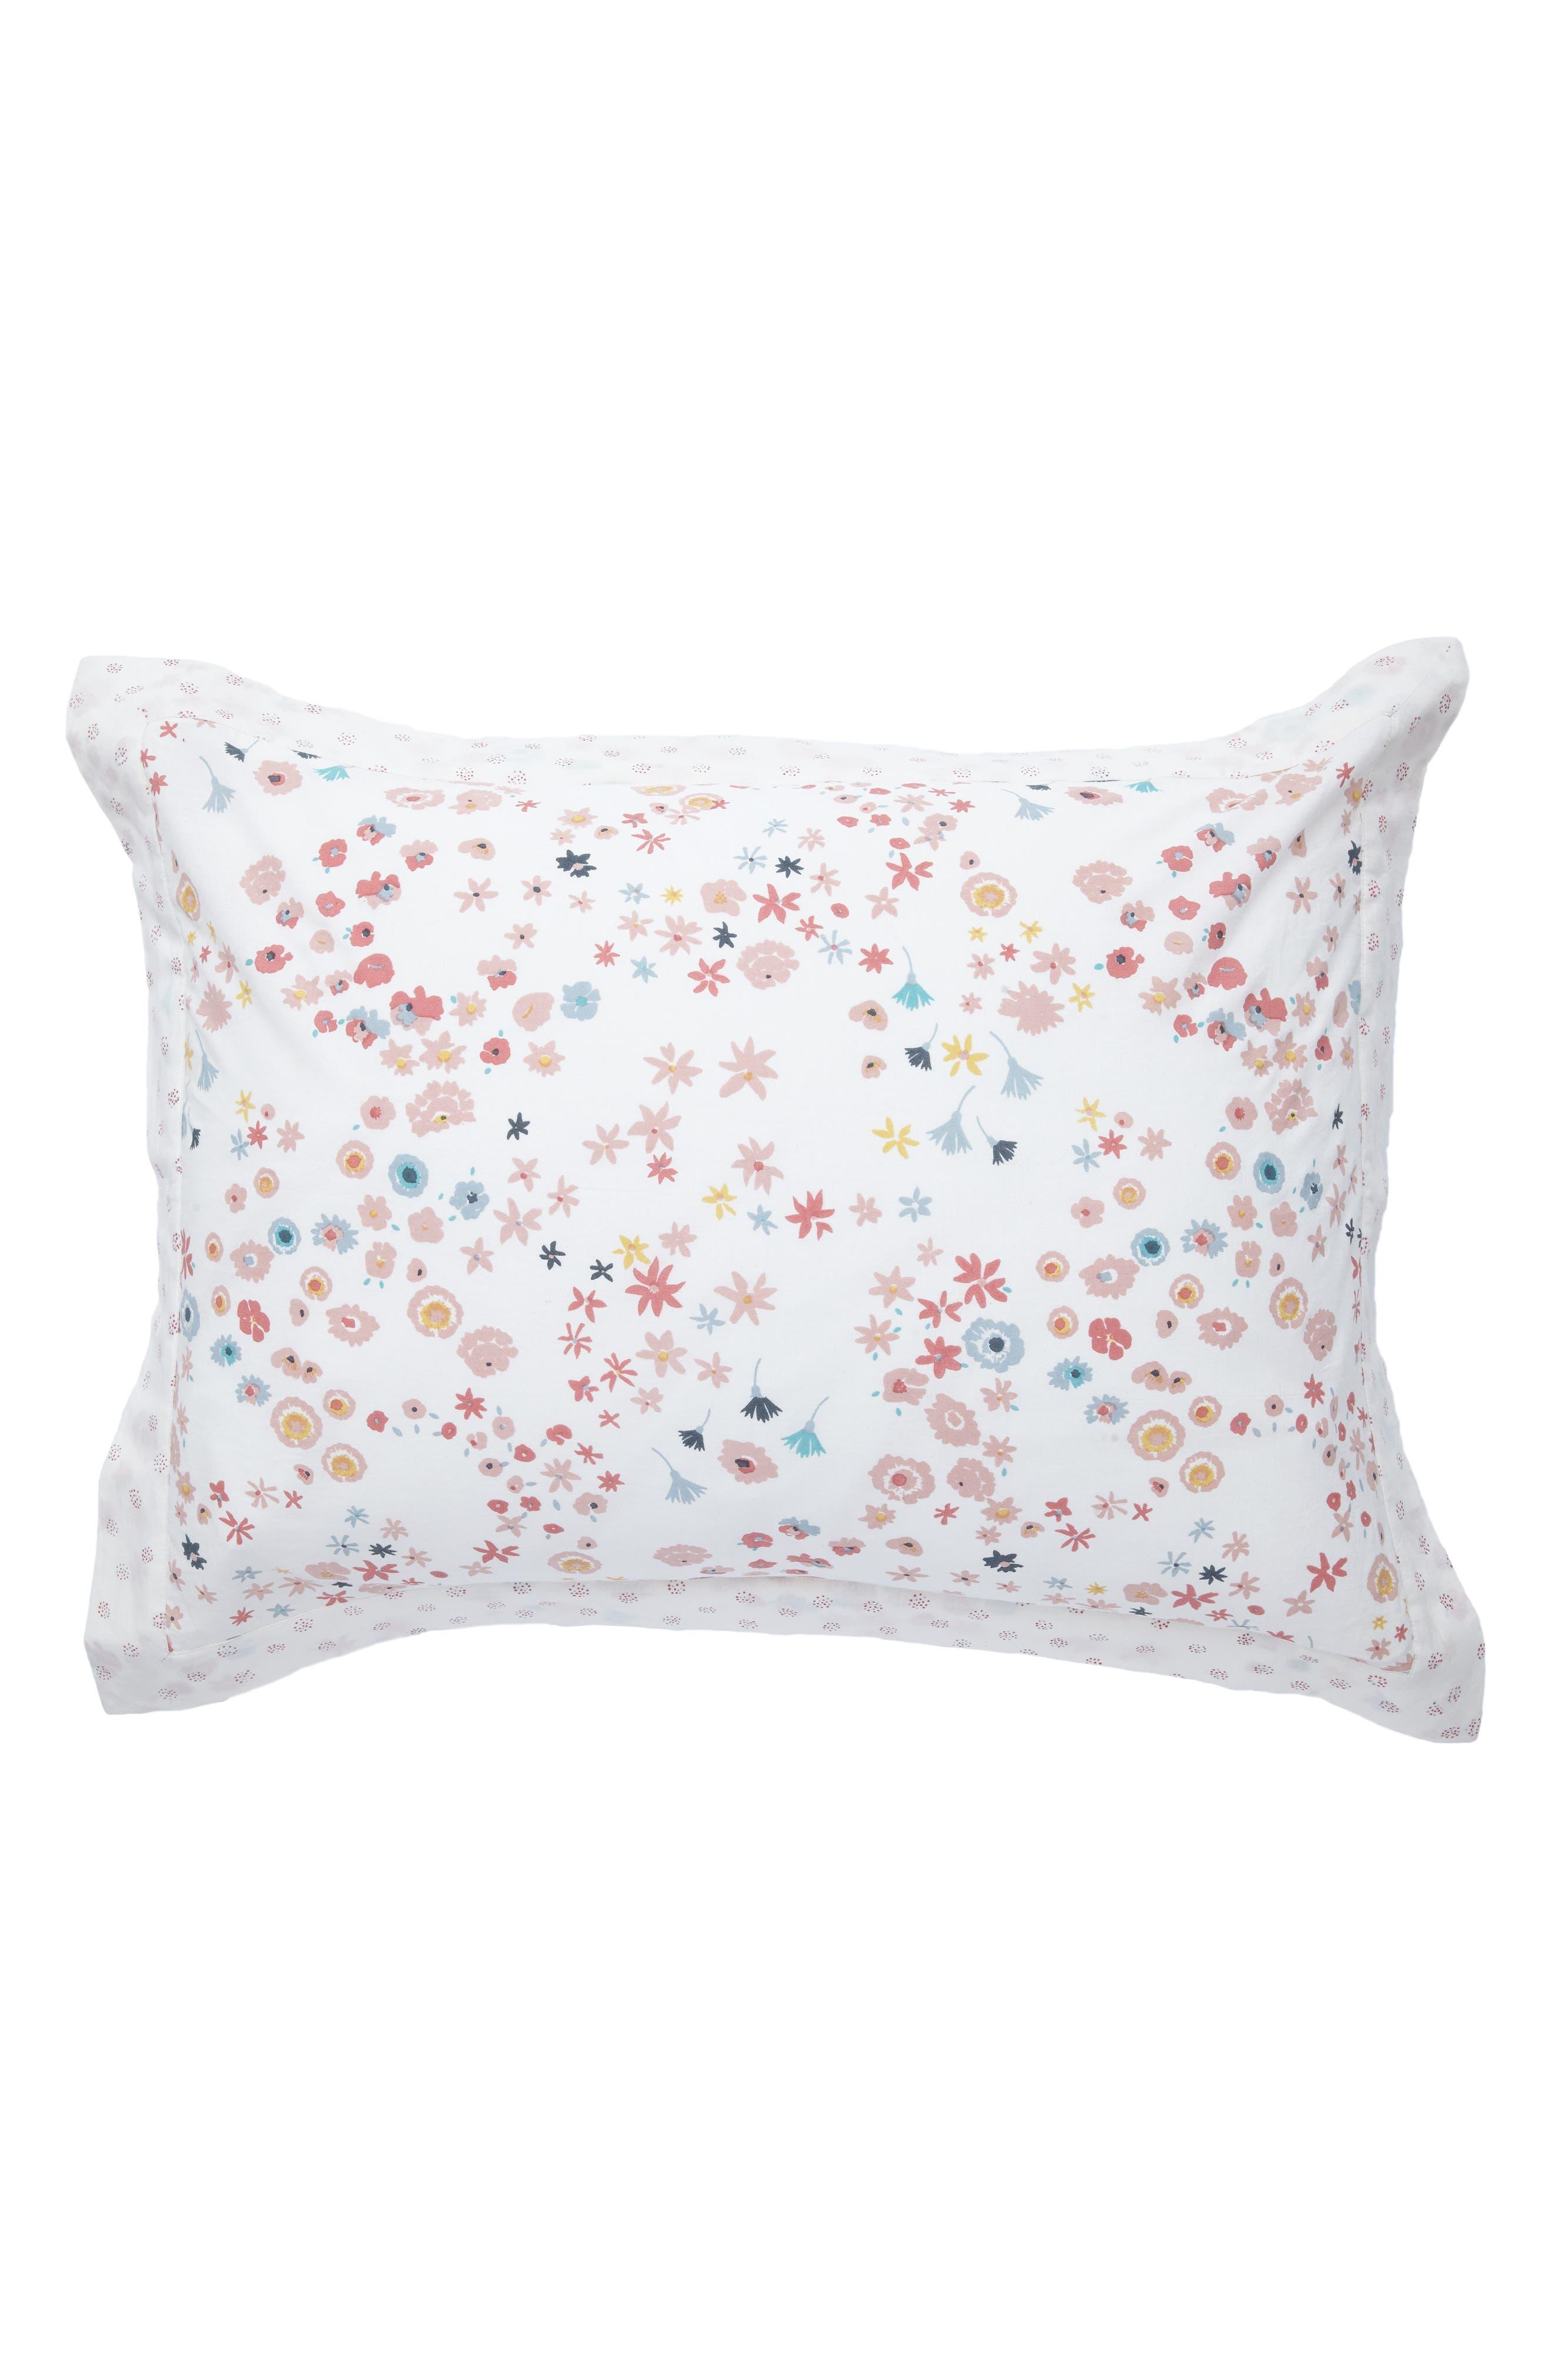 Reversible Standard Pillow Sham,                             Main thumbnail 1, color,                             PINK